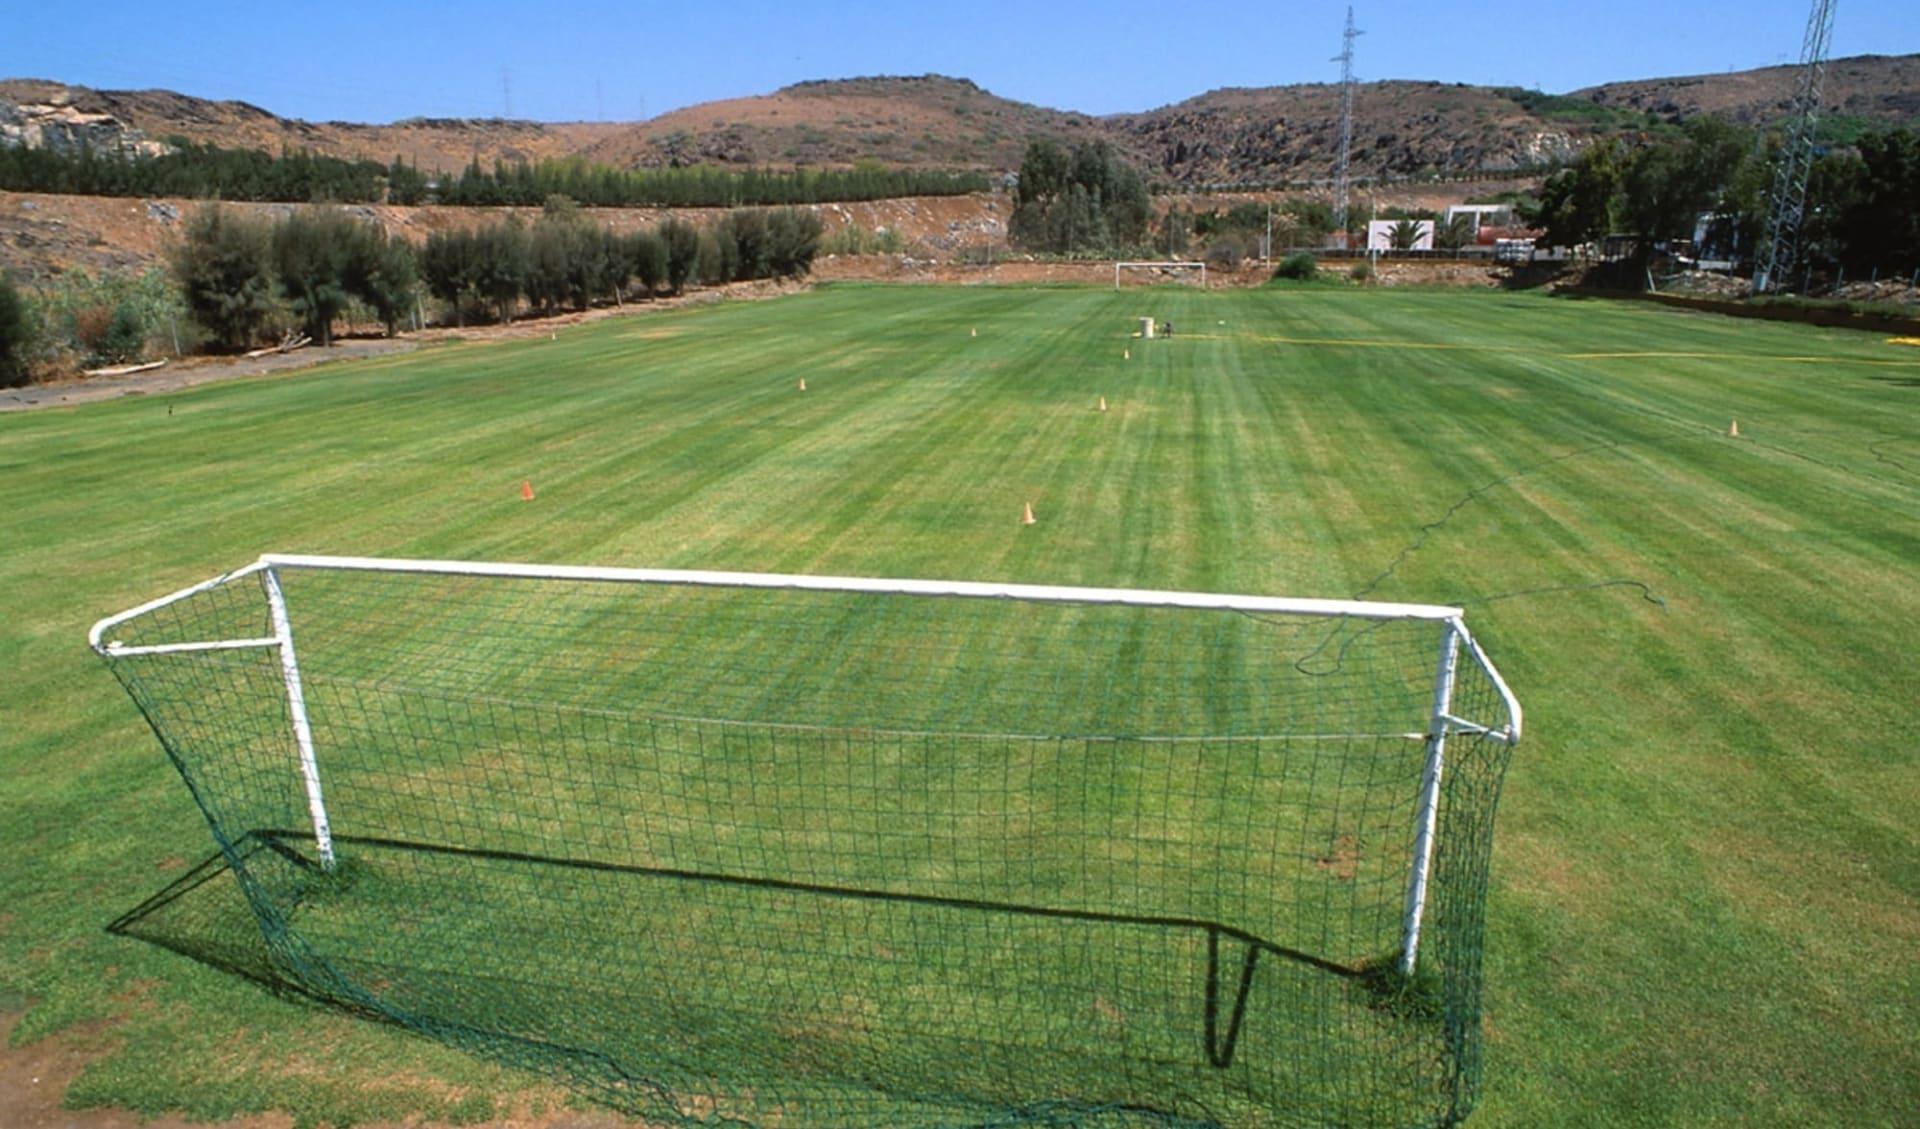 Playa del Ingles - Hotel Beverly Park ab Gran Canaria: A1_Platz mit Goal